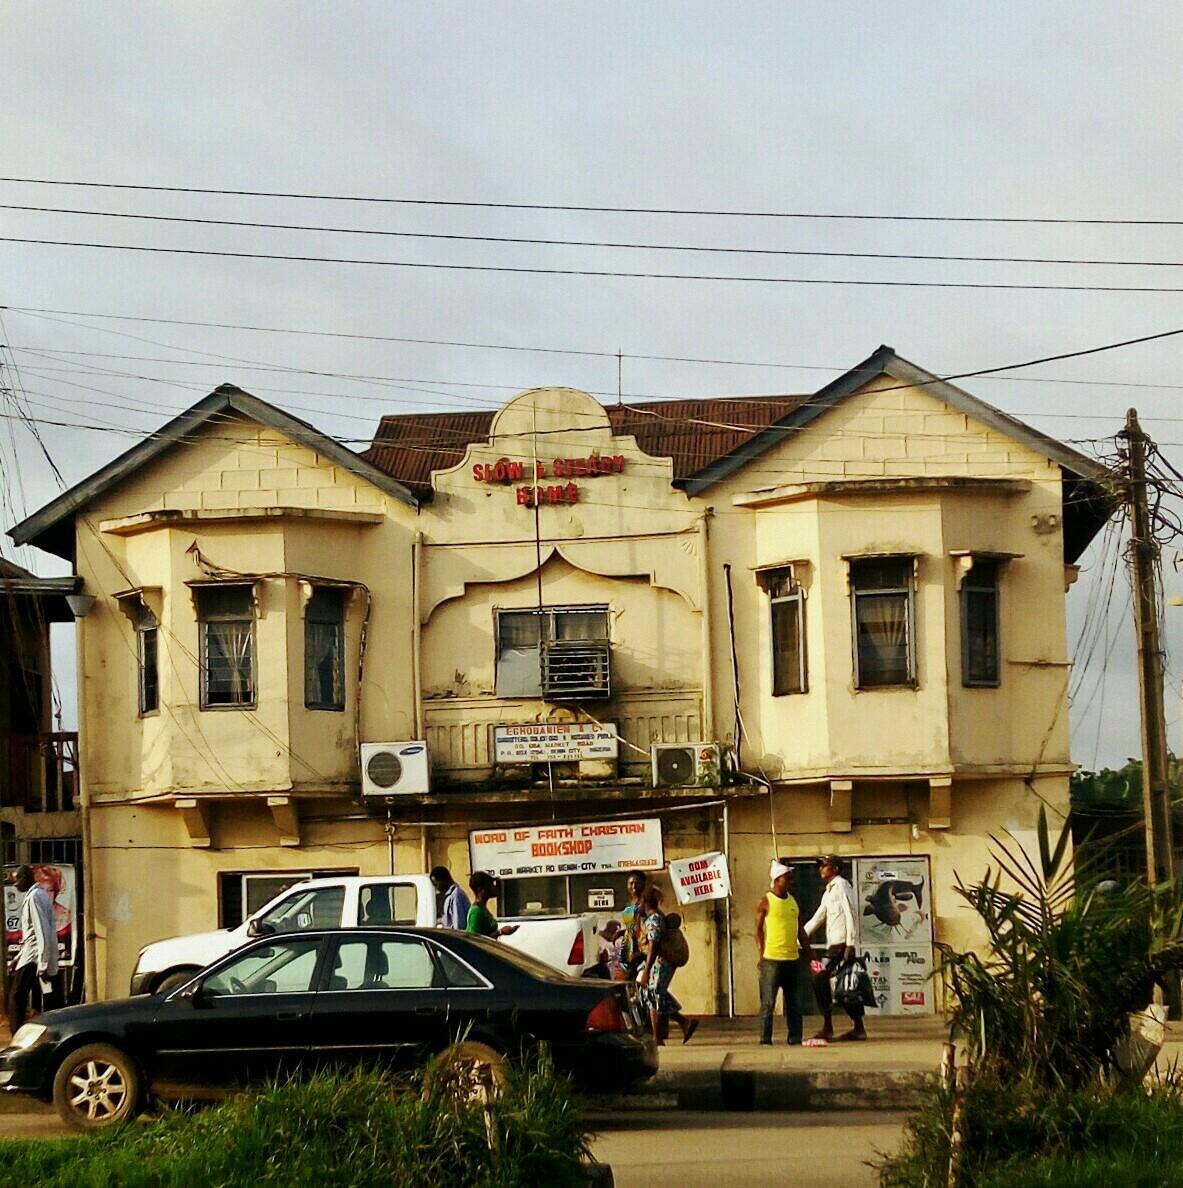 Road benin state ring city nigeria edo Benin City